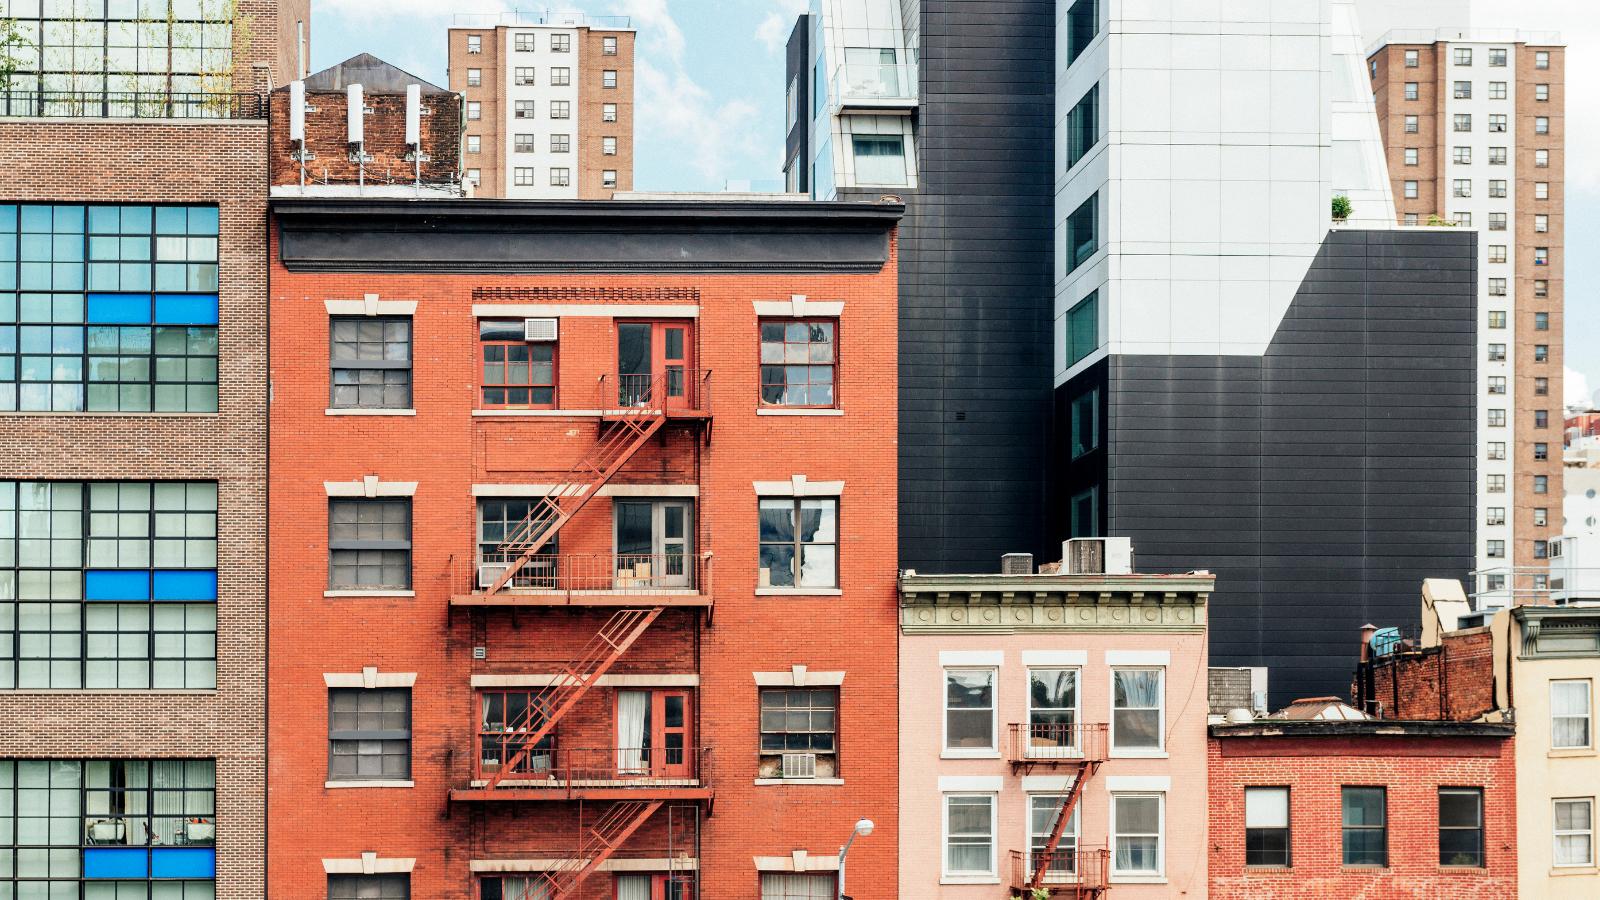 New York City housing